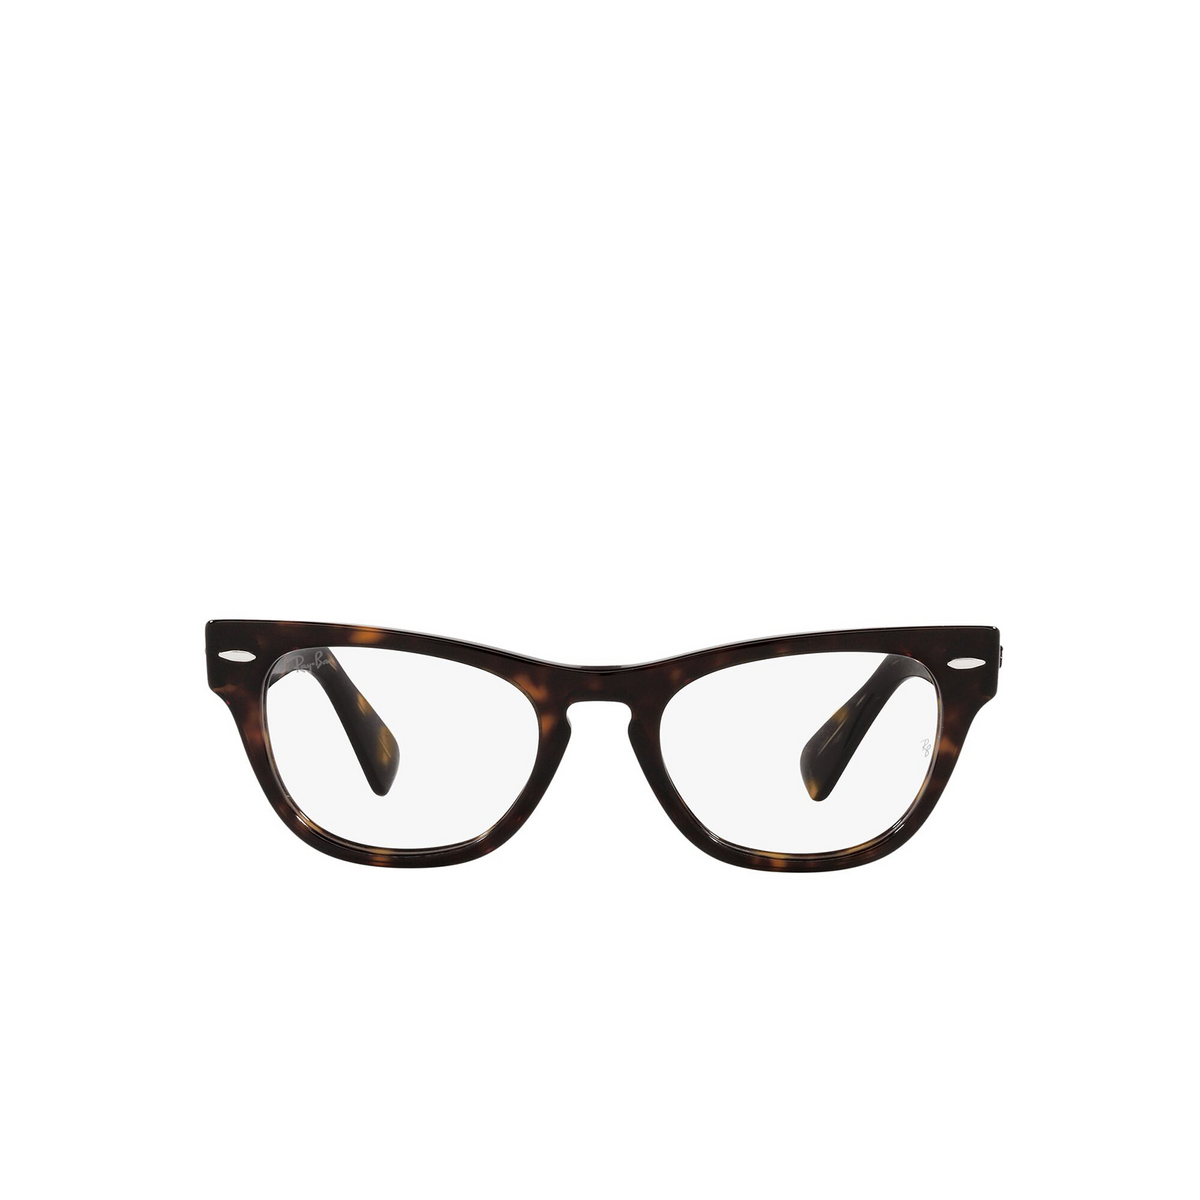 Ray-Ban® Square Eyeglasses: Laramie RX2201V color Havana 2012 - front view.